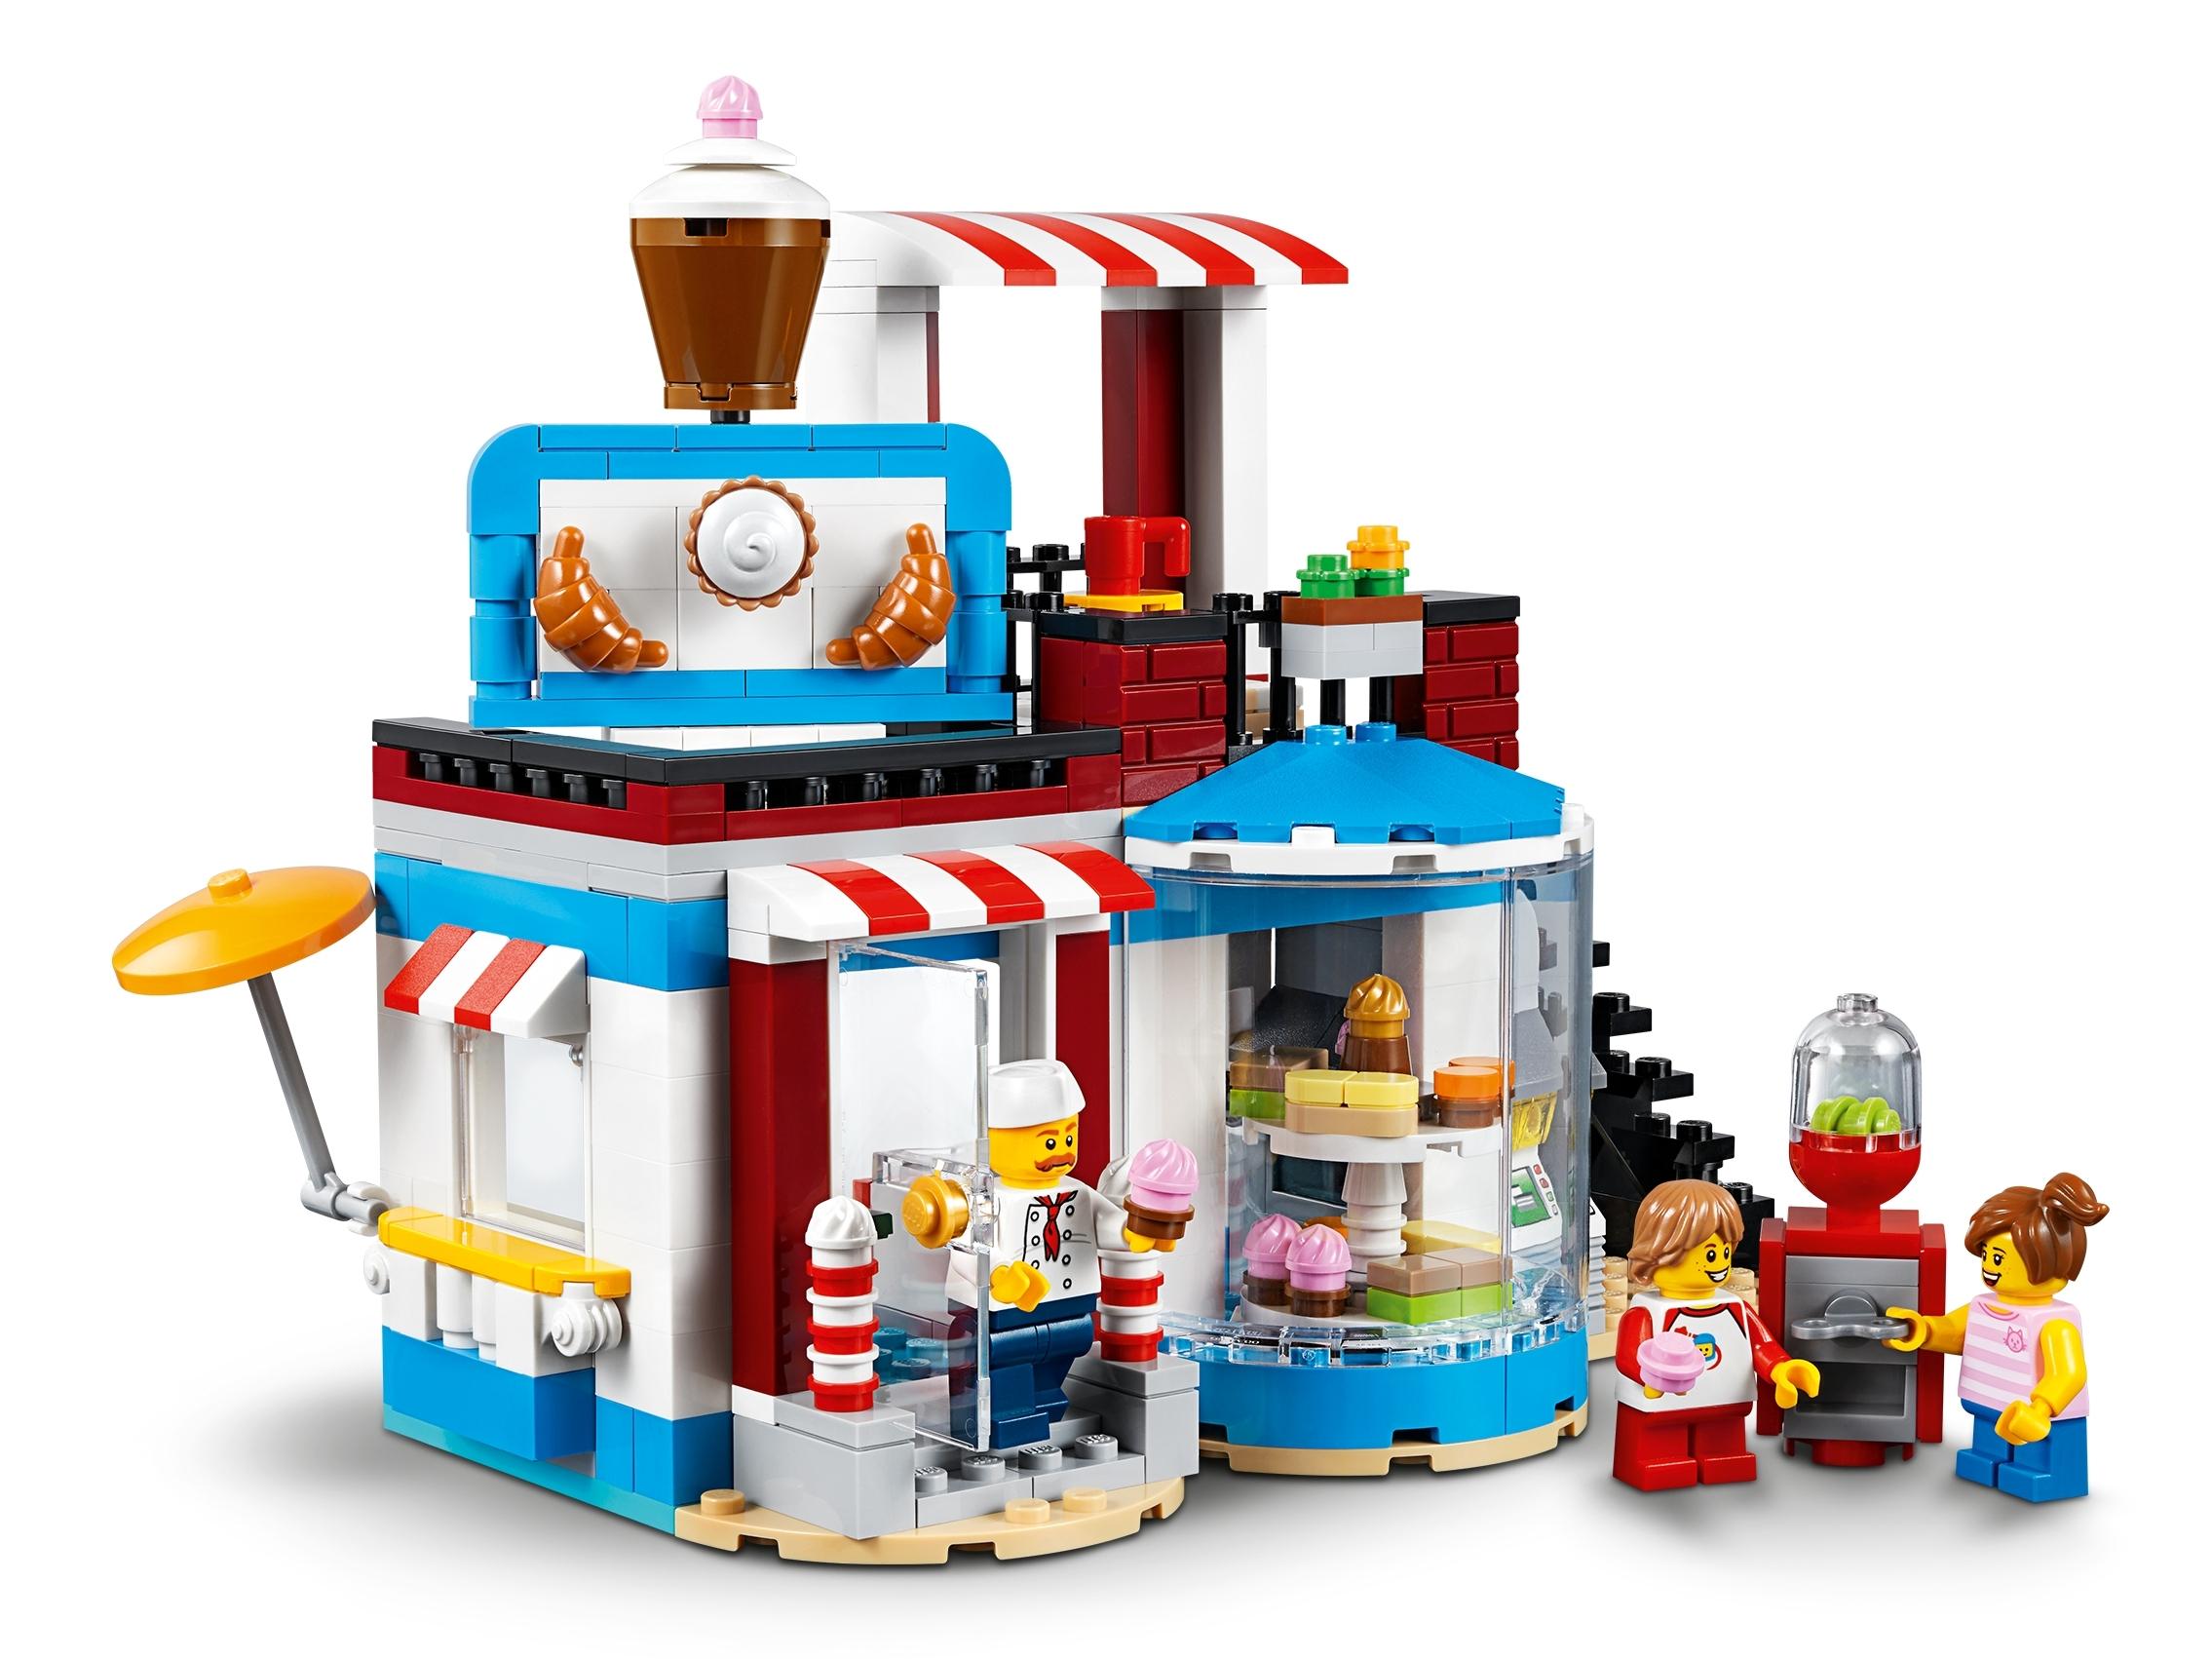 Lego 31077 Creator Modular Sweet surprises Building Set